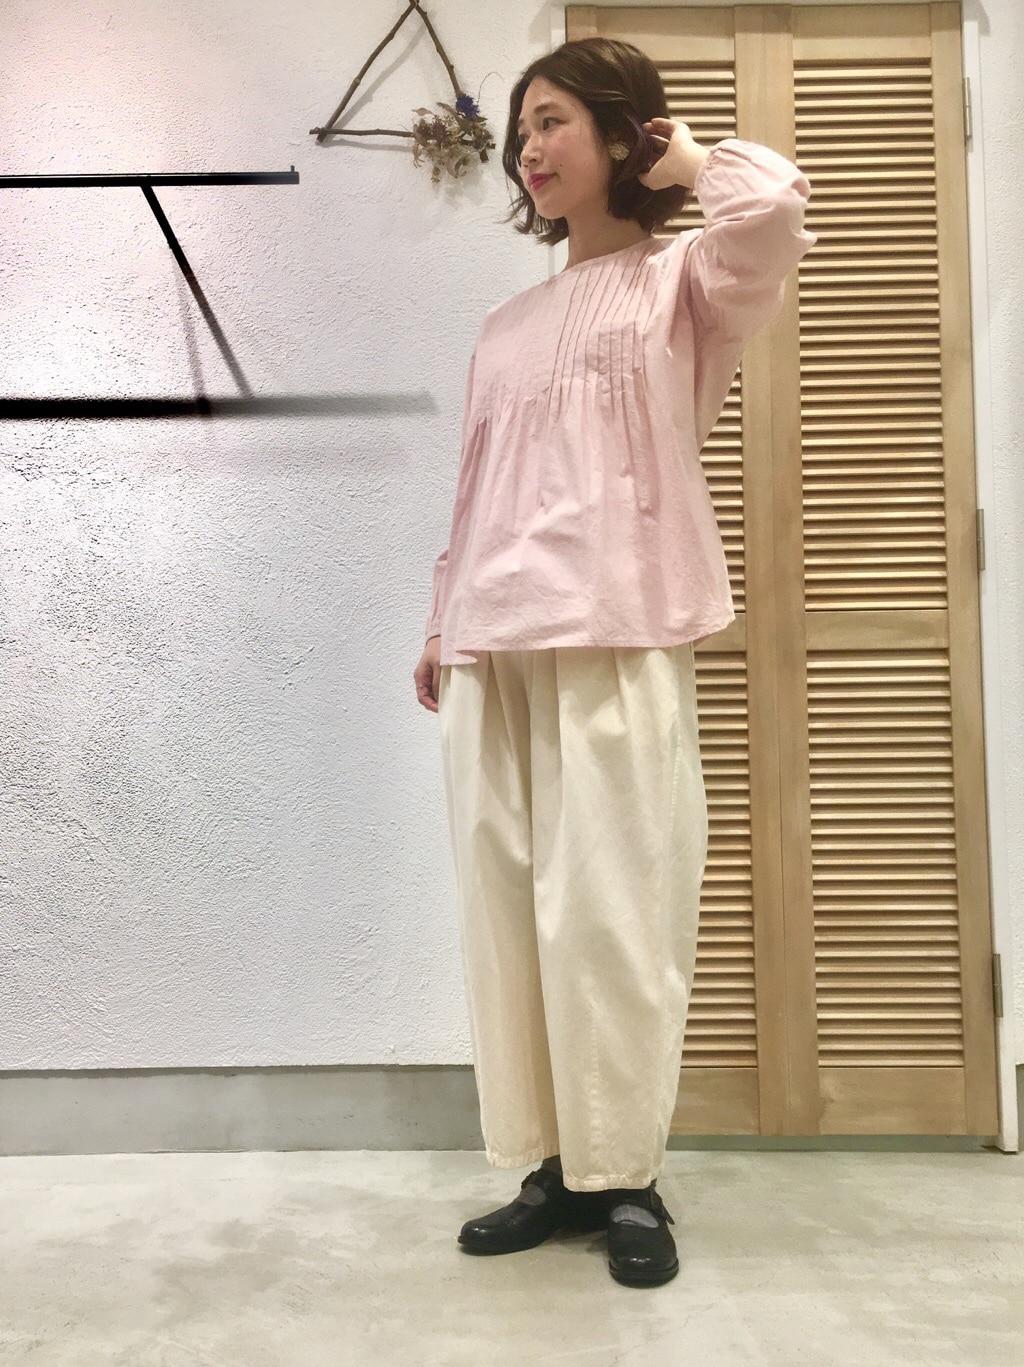 chambre de charme 横浜ジョイナス 身長:160cm 2021.02.12